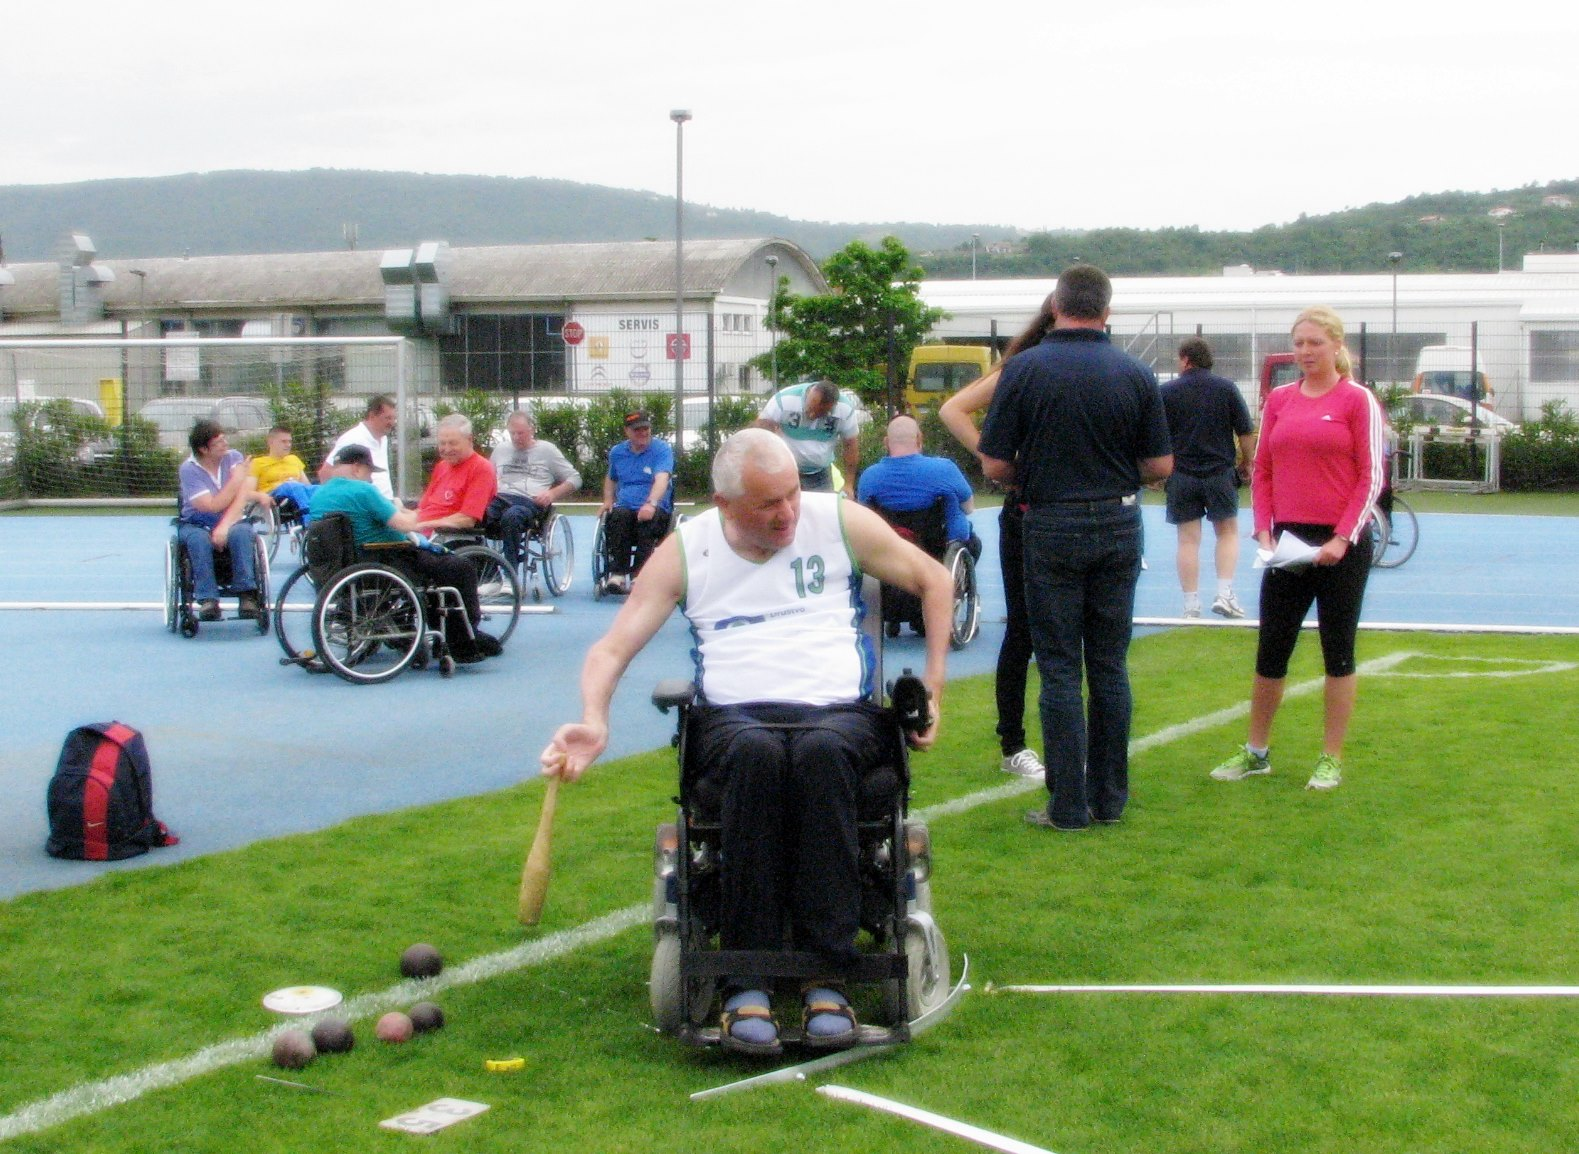 atletika-paraplegiki-koper-liga2014-2